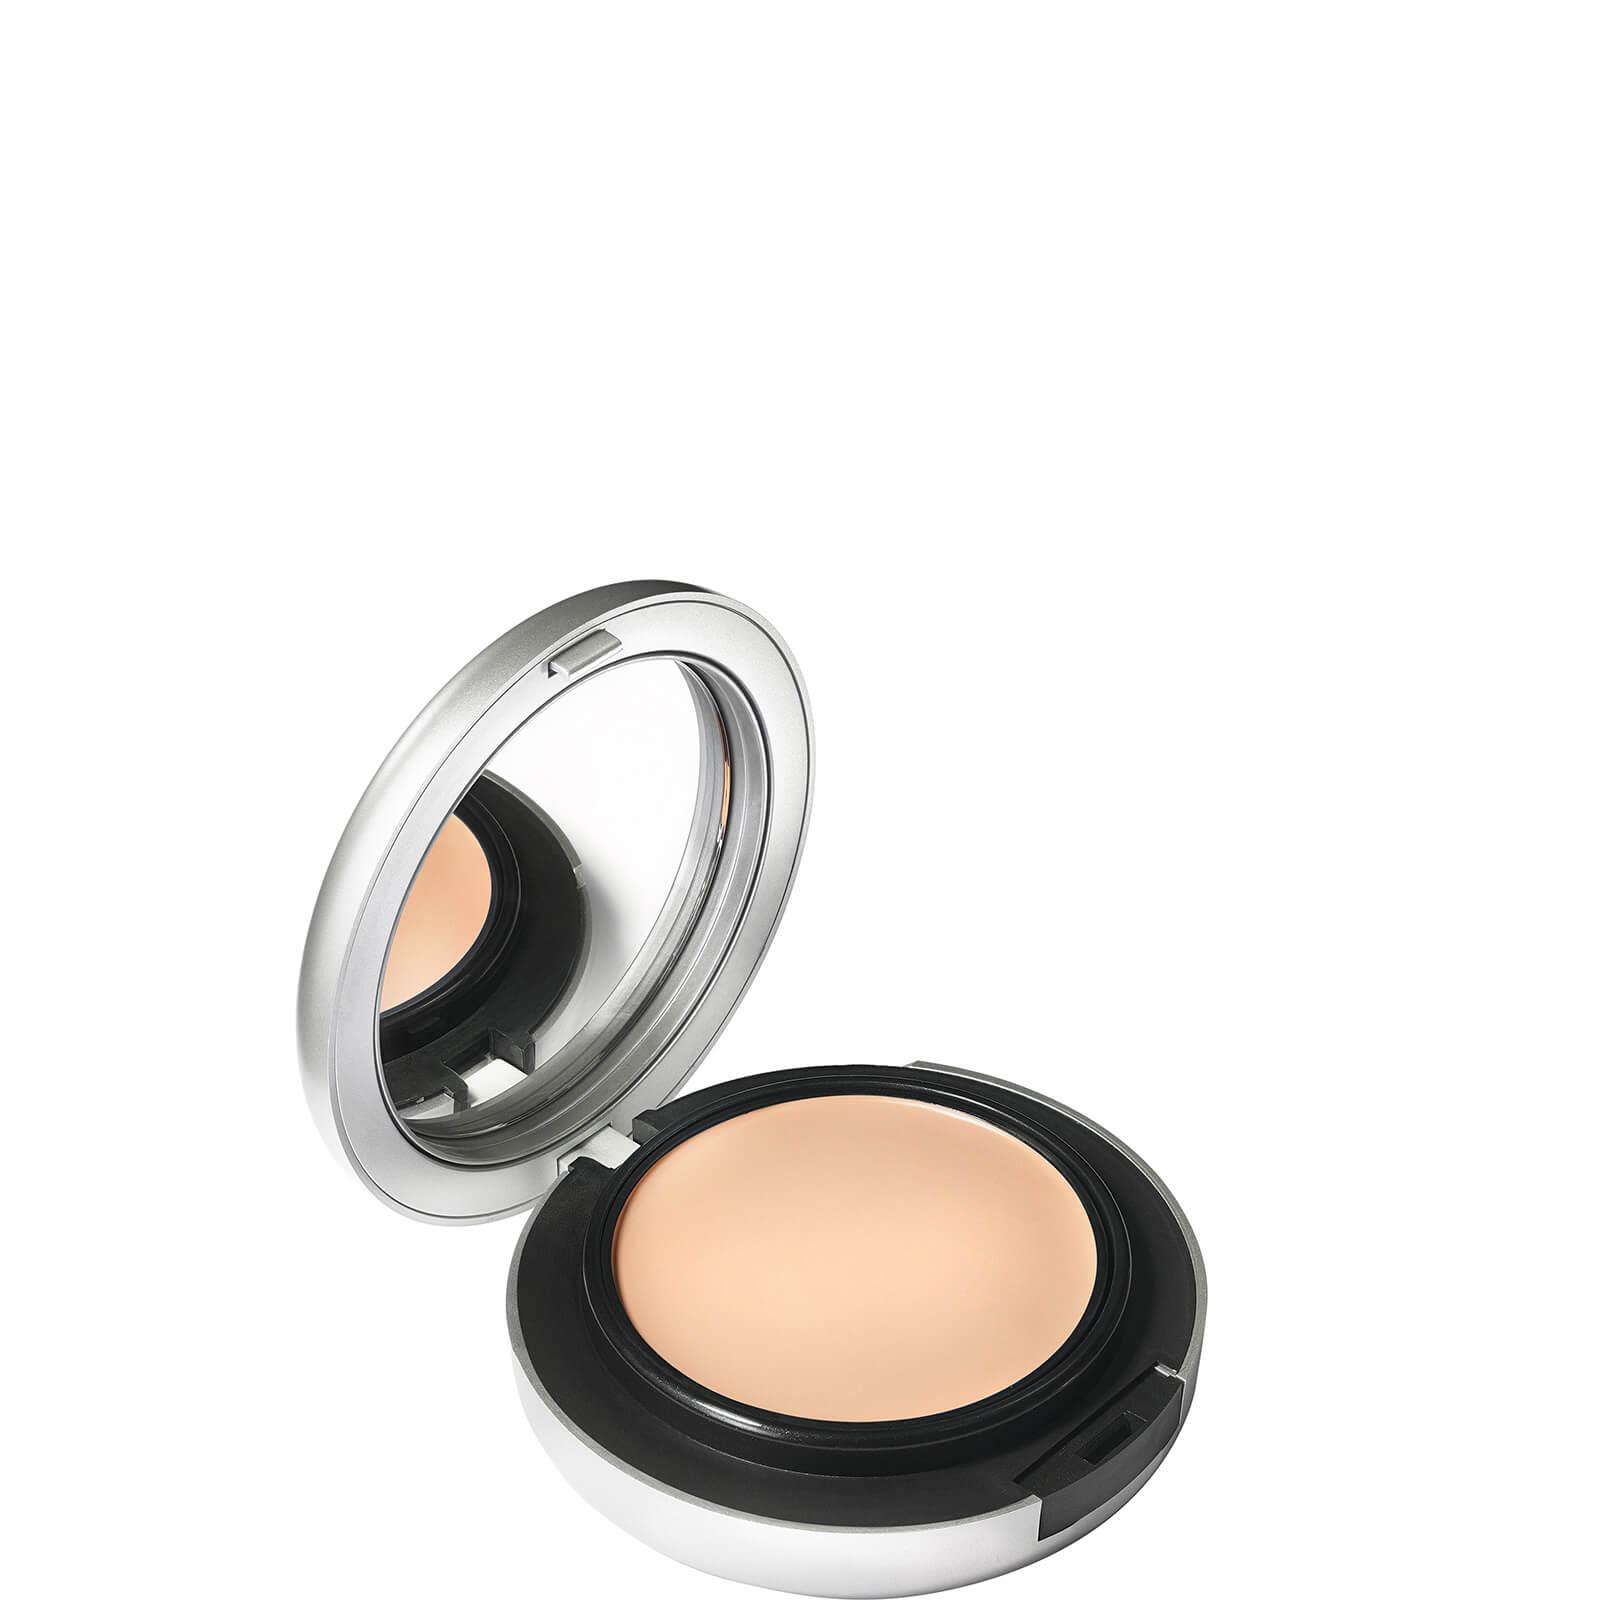 MAC Studio Fix Tech Cream-to-Powder Foundation 10g (Various Shades) - NC10